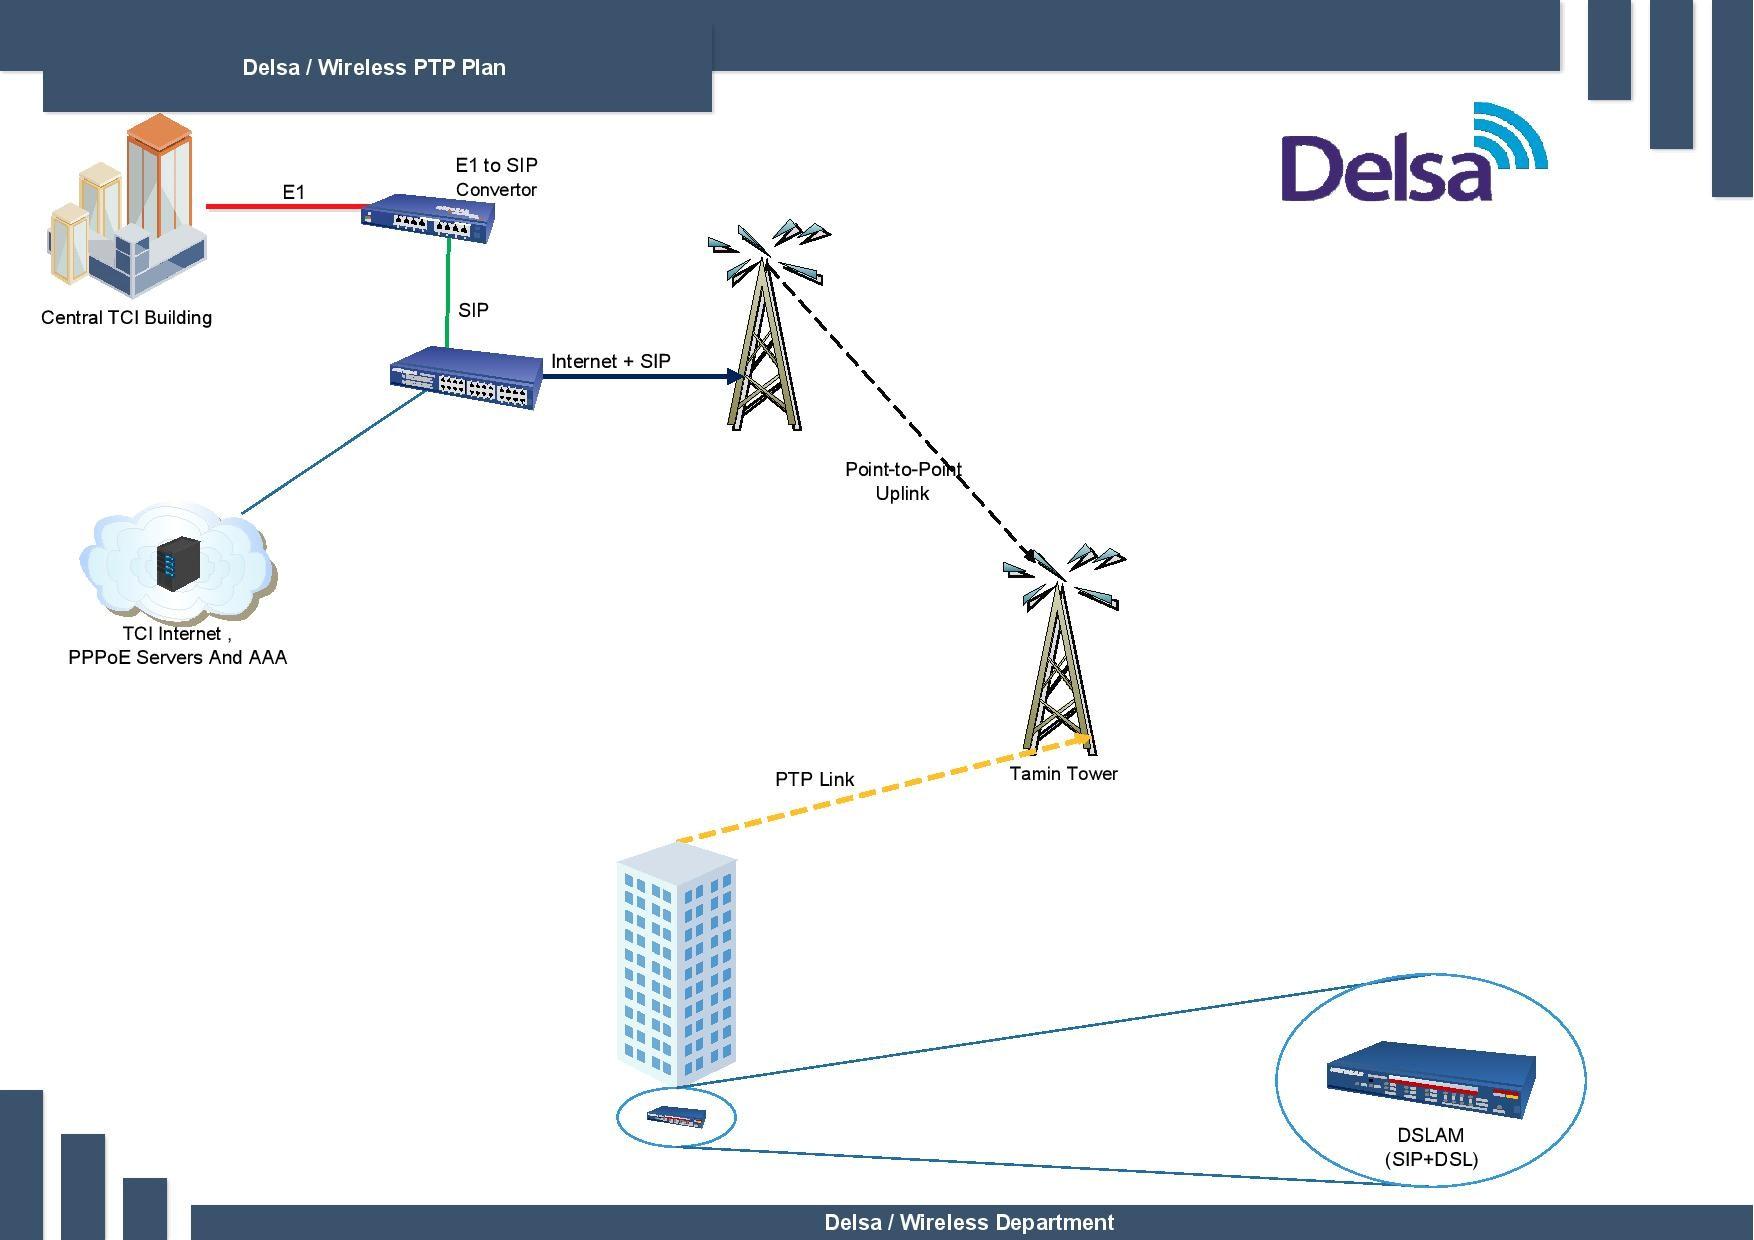 DSLAM1